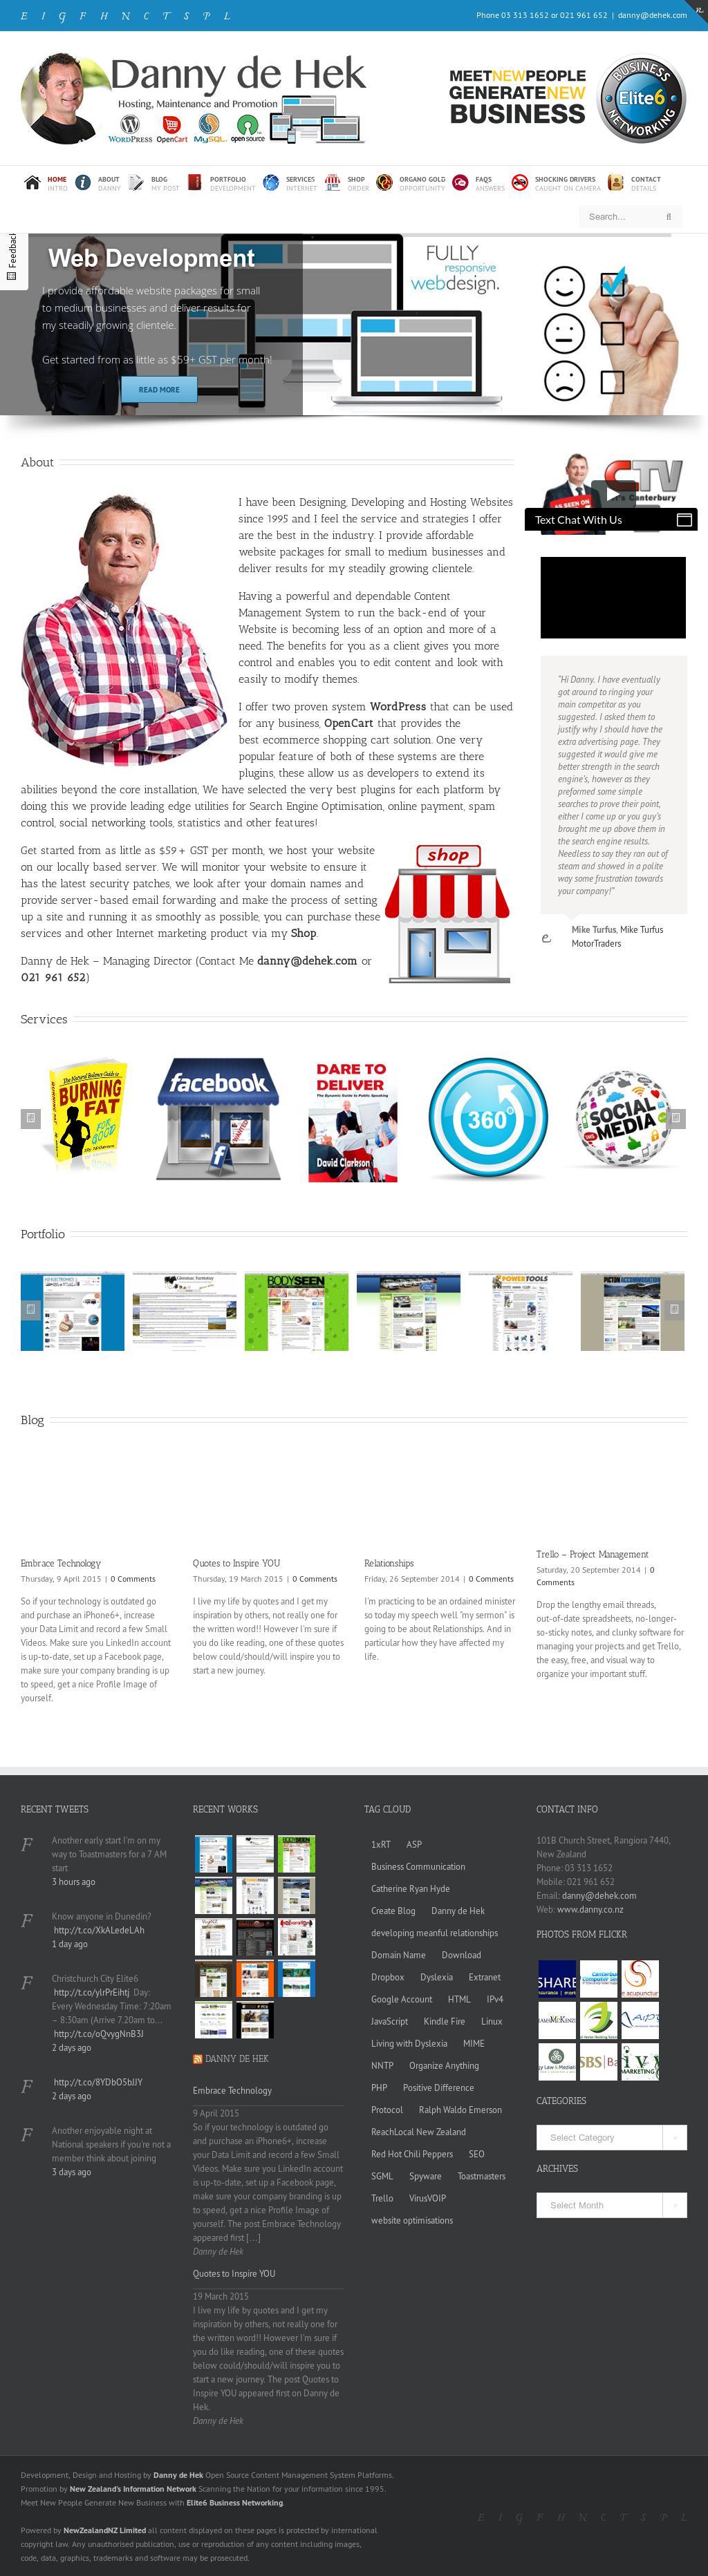 Danny De Hek Competitors, Revenue and Employees - Owler